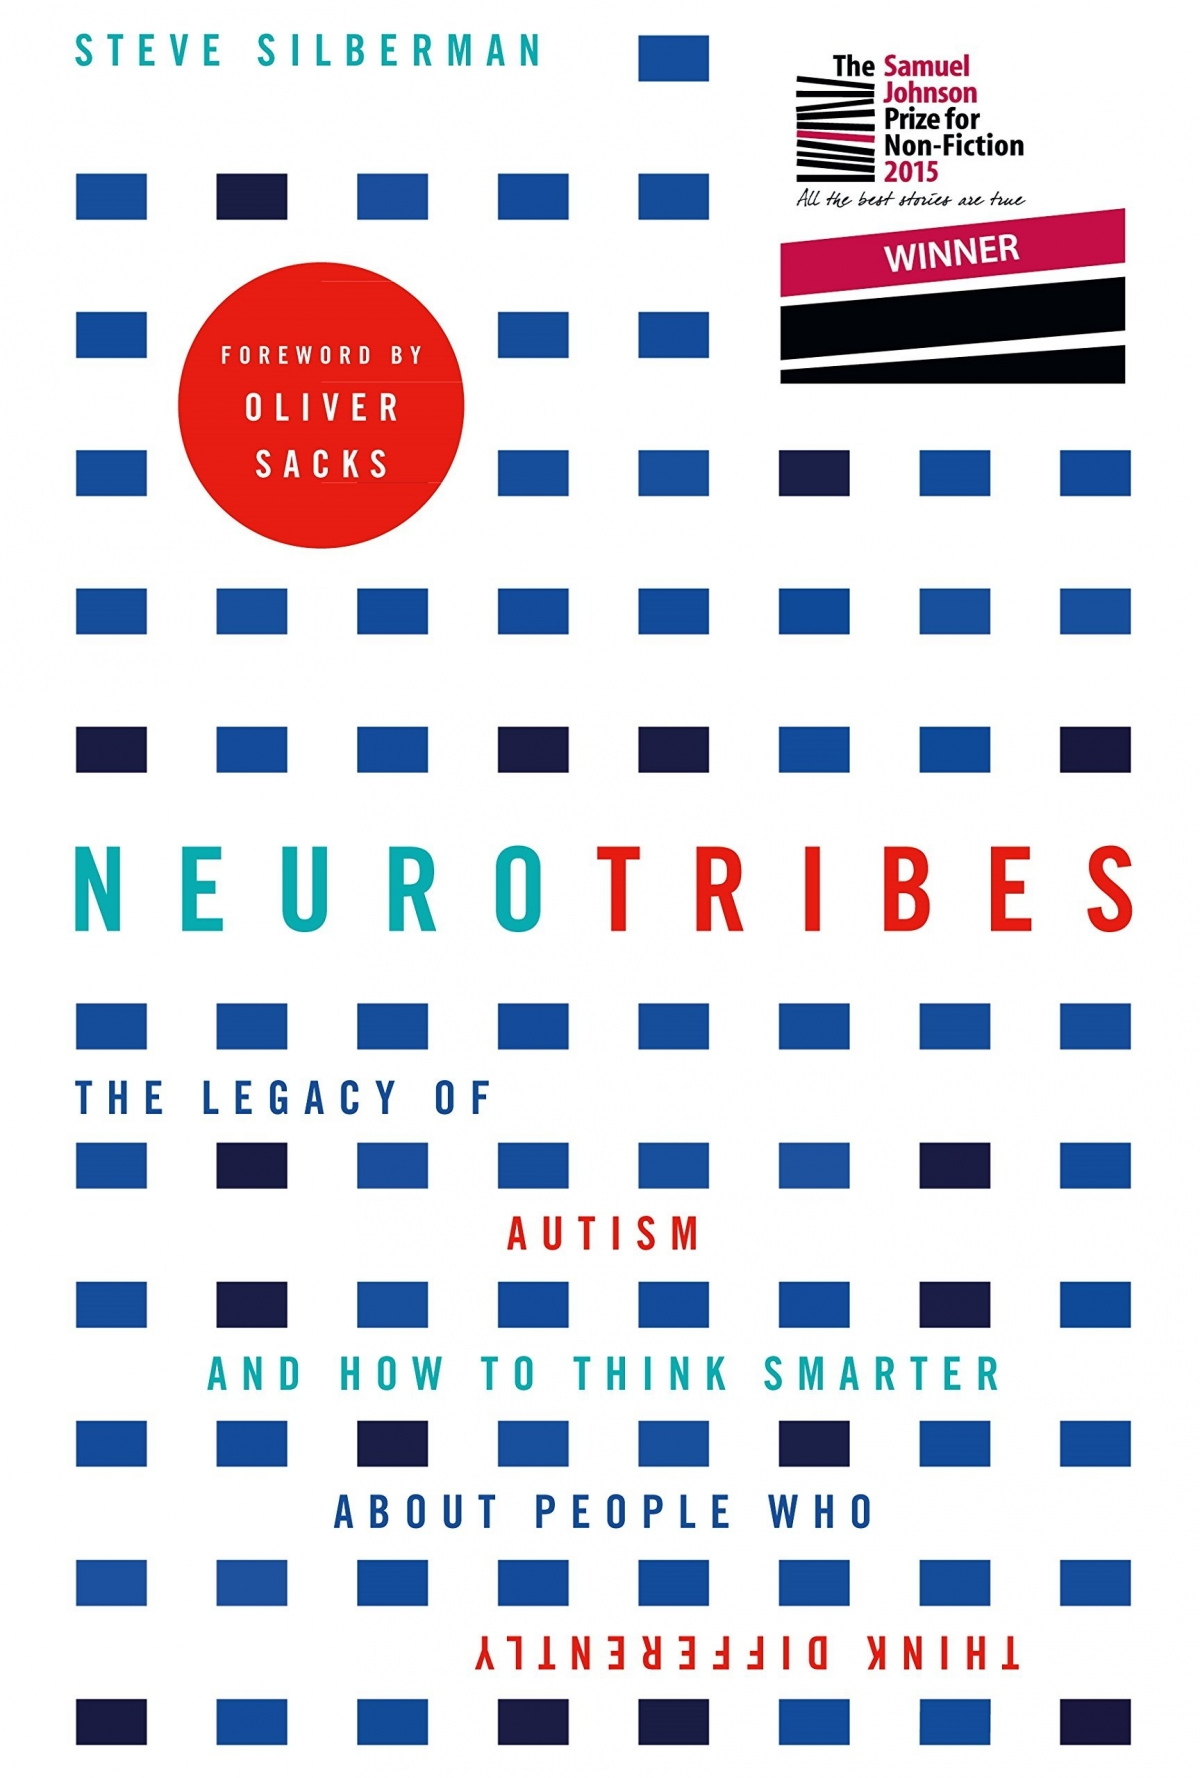 top non-fiction books of 2015